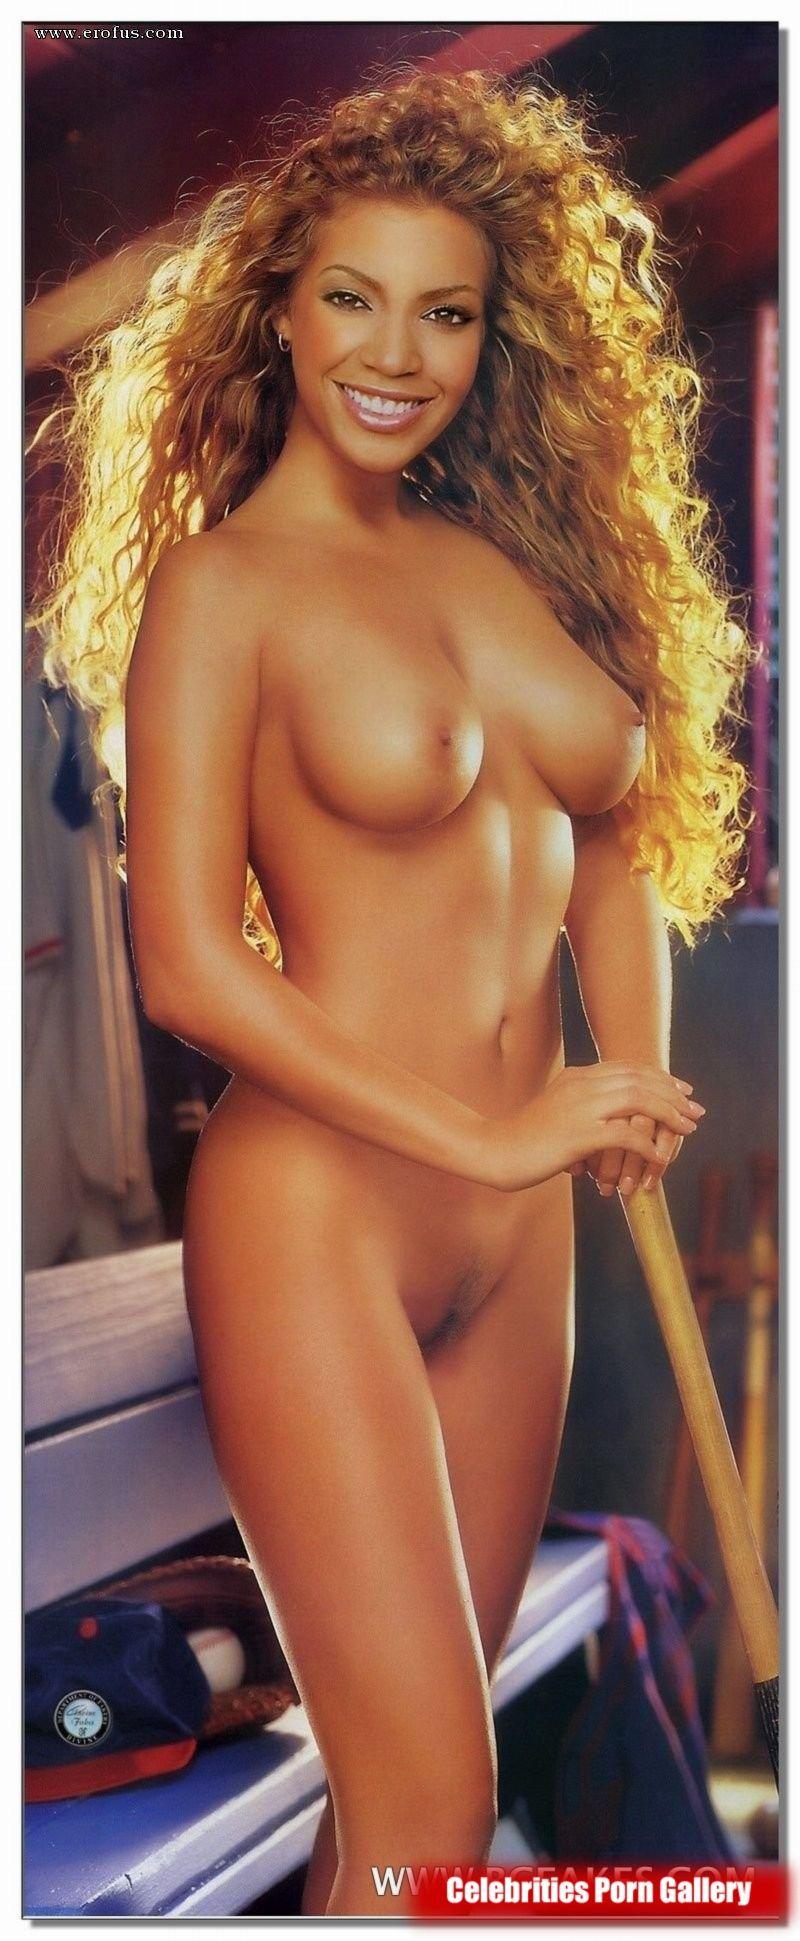 Beyonce Knowles pic porno